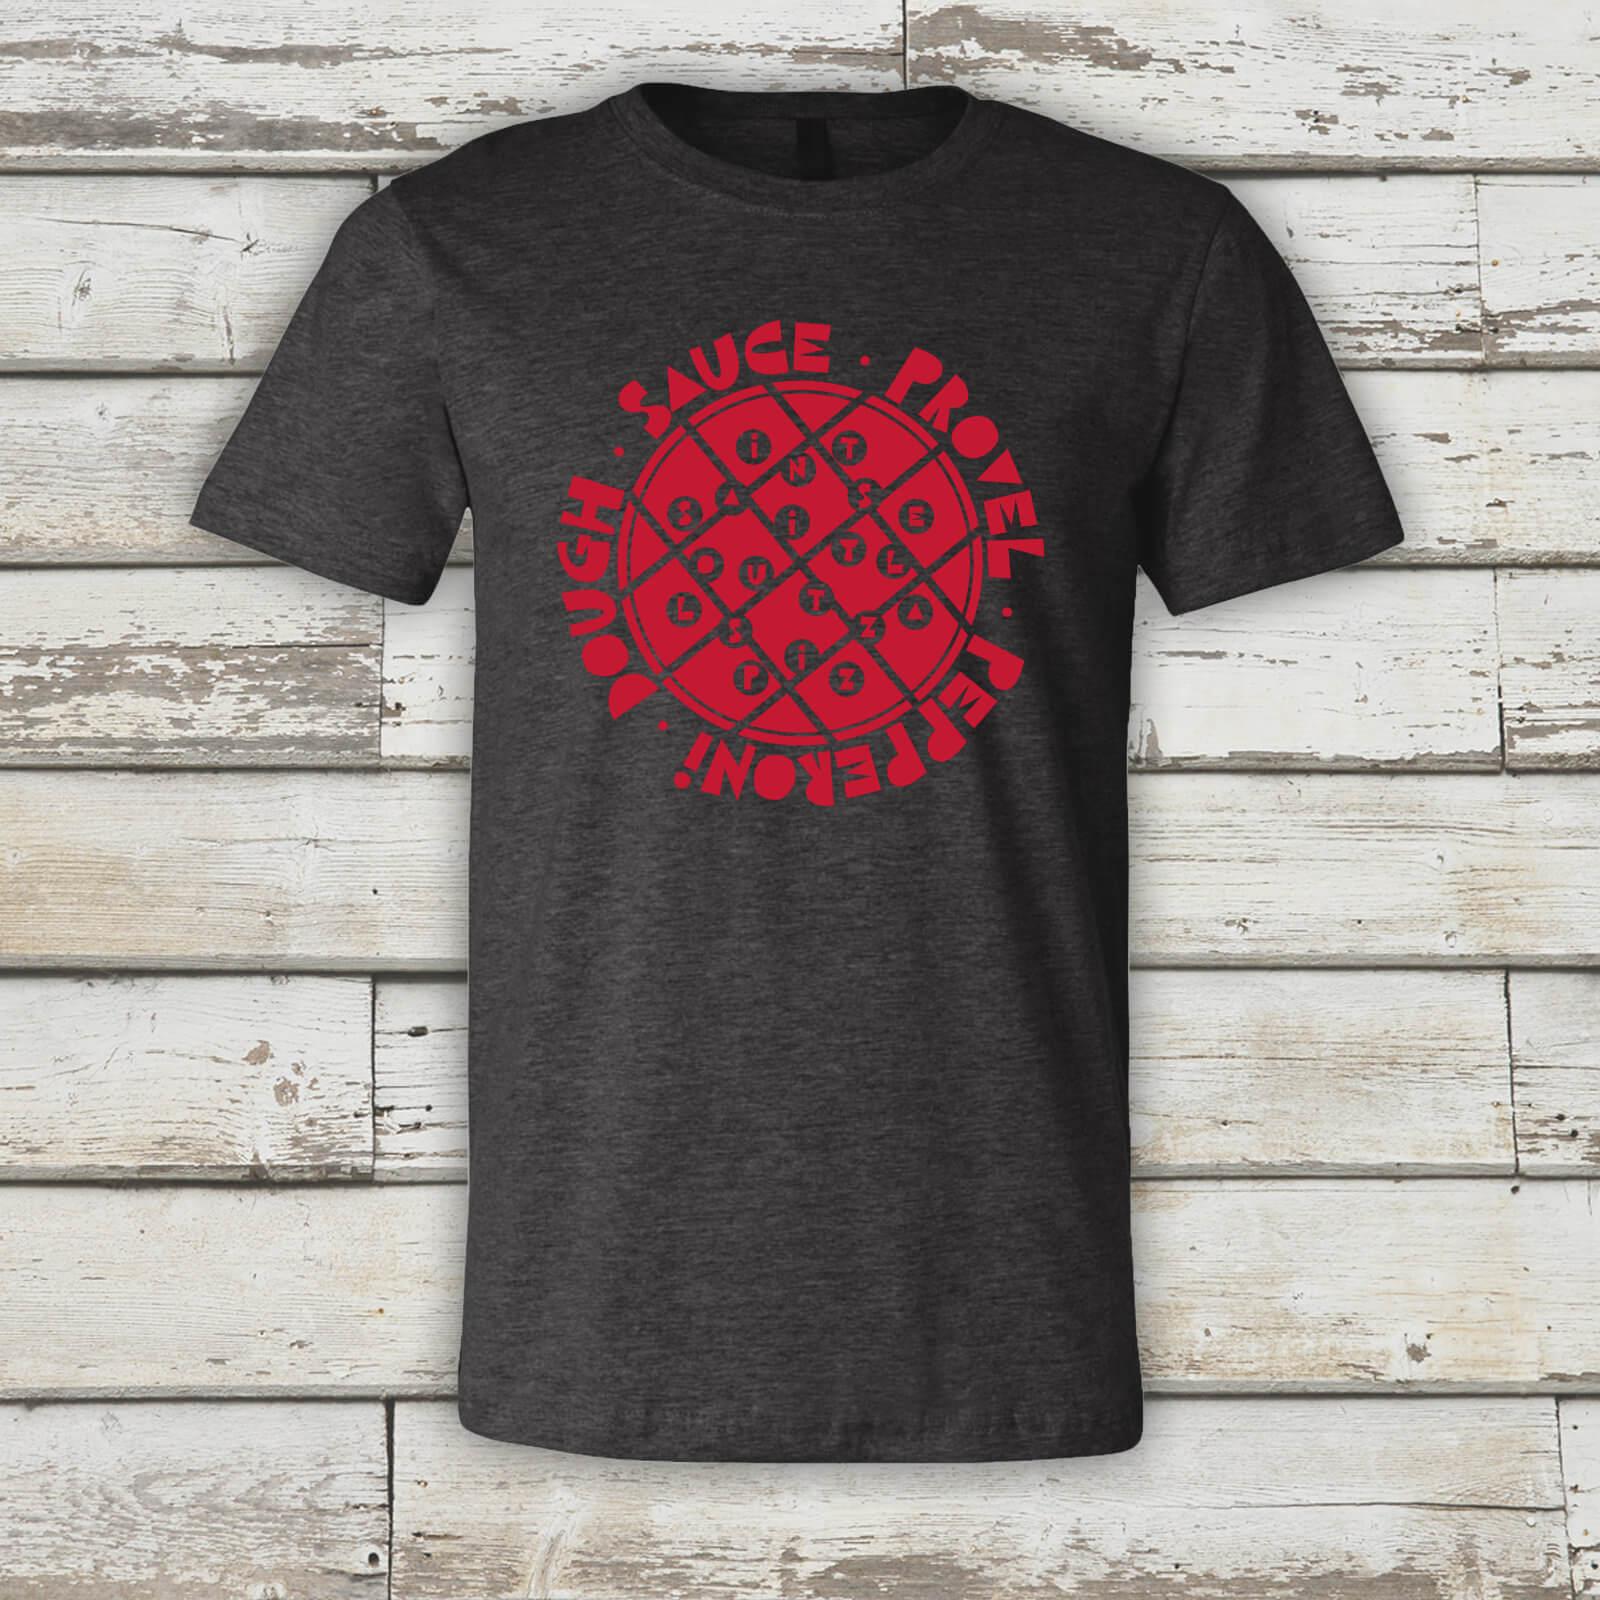 St. Louis-style pizza shirt